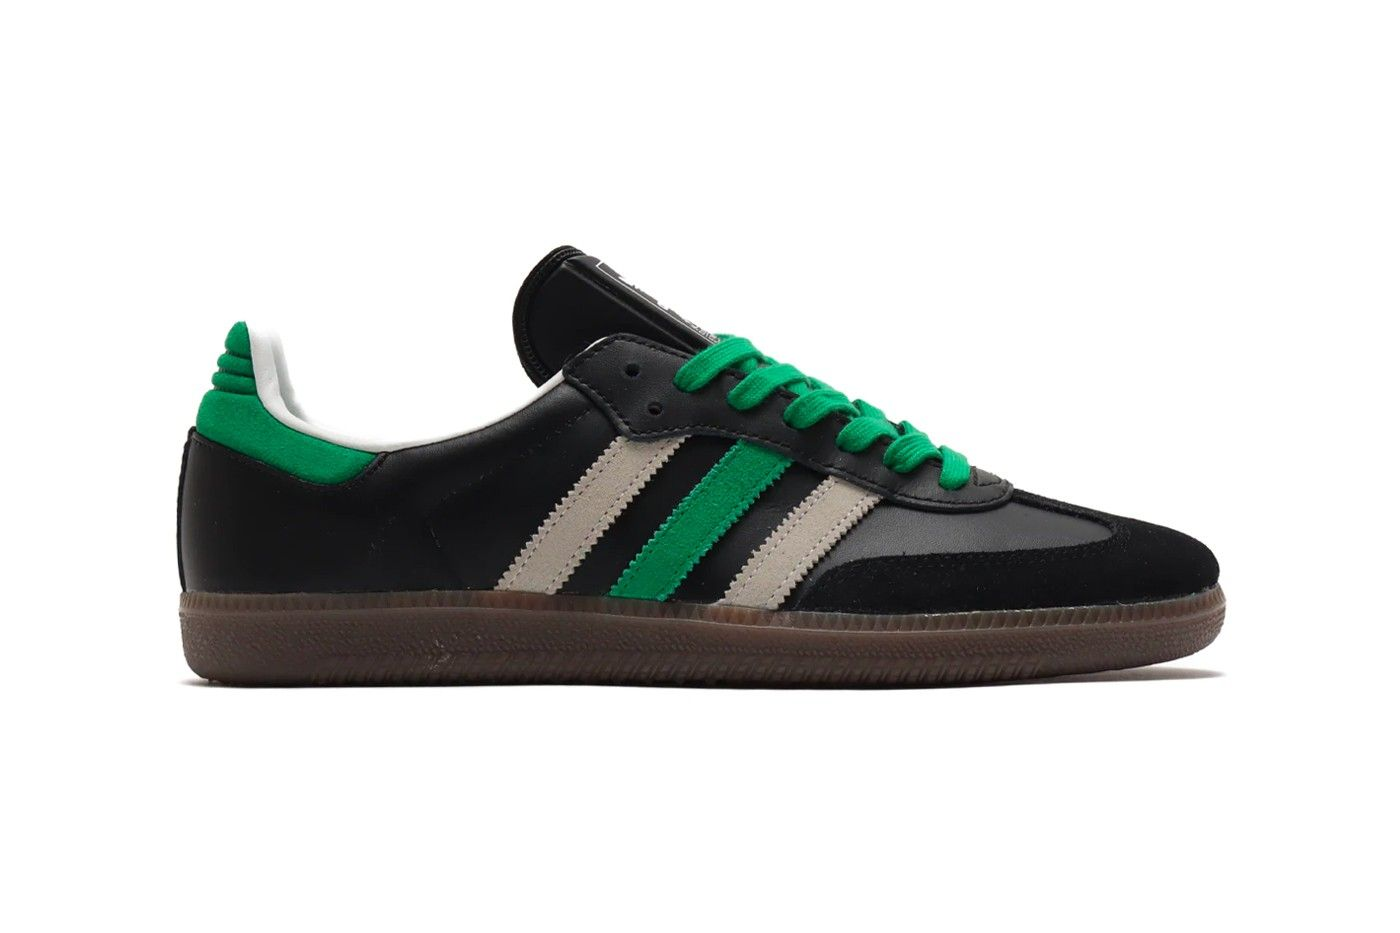 adidas Samba Mismatched Right